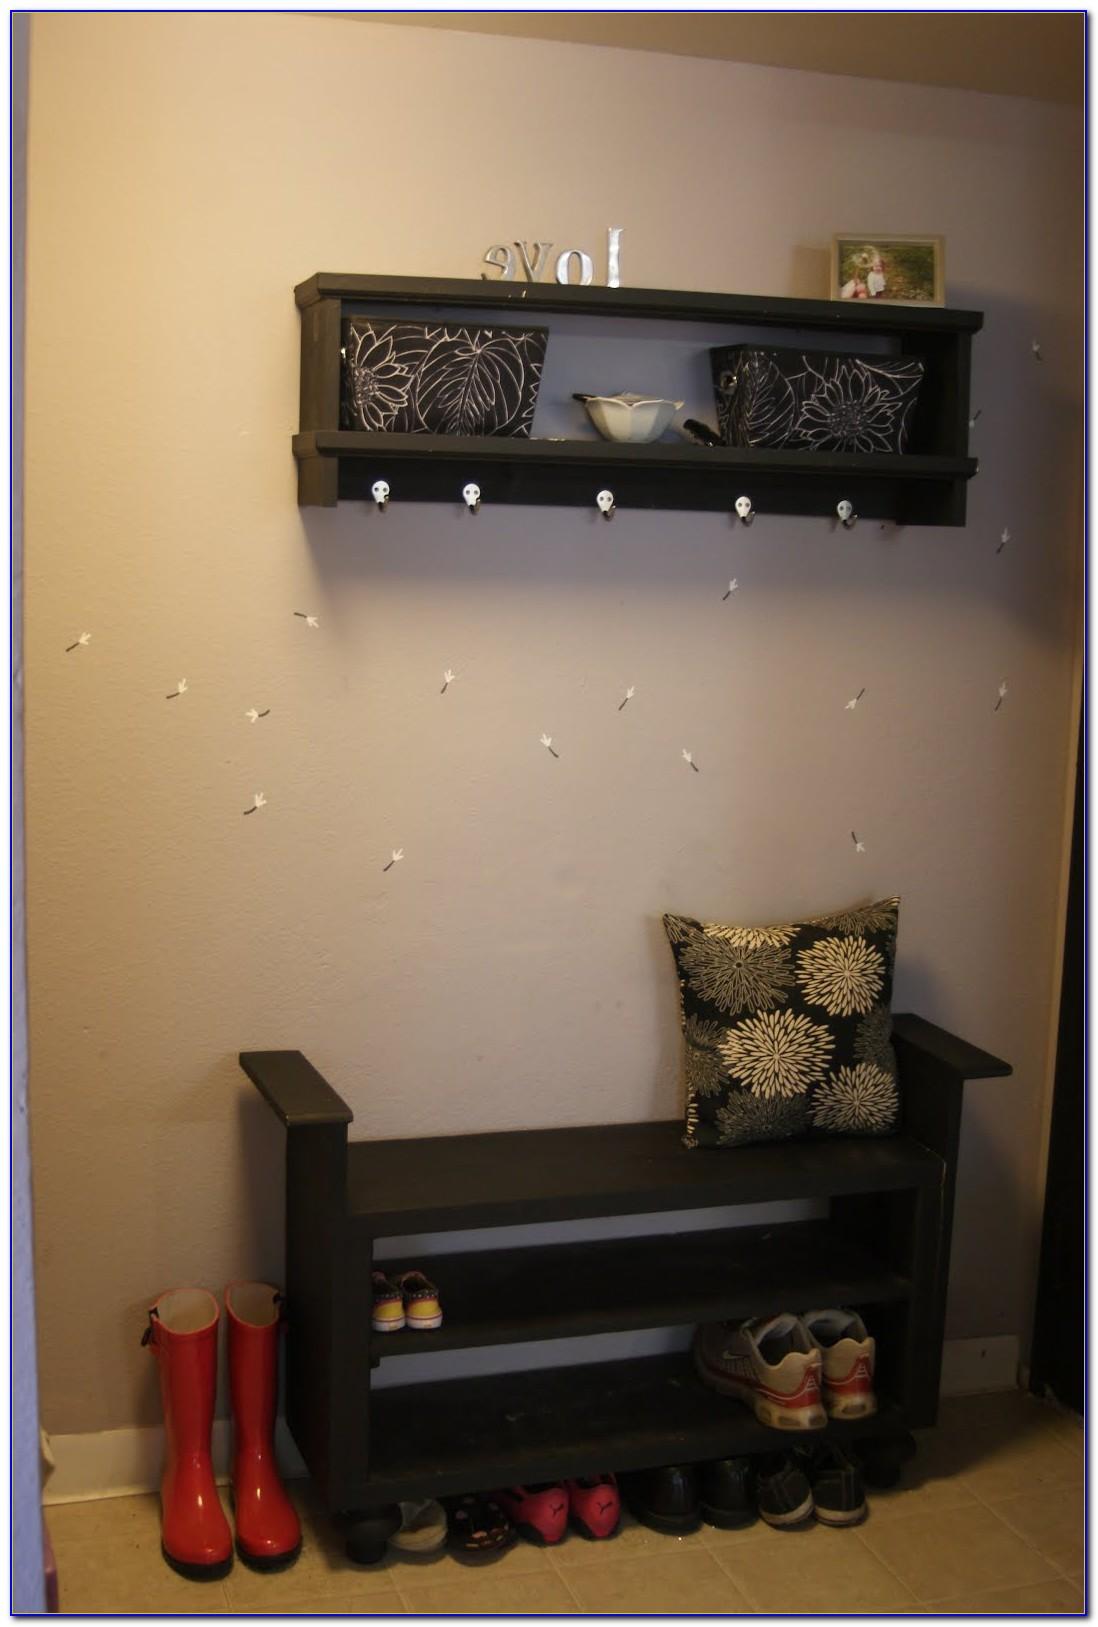 Entryway Bench With Shoe Storage Diy Dolce Vizio Tiramisu,Diy Christmas Decorations For Your Room